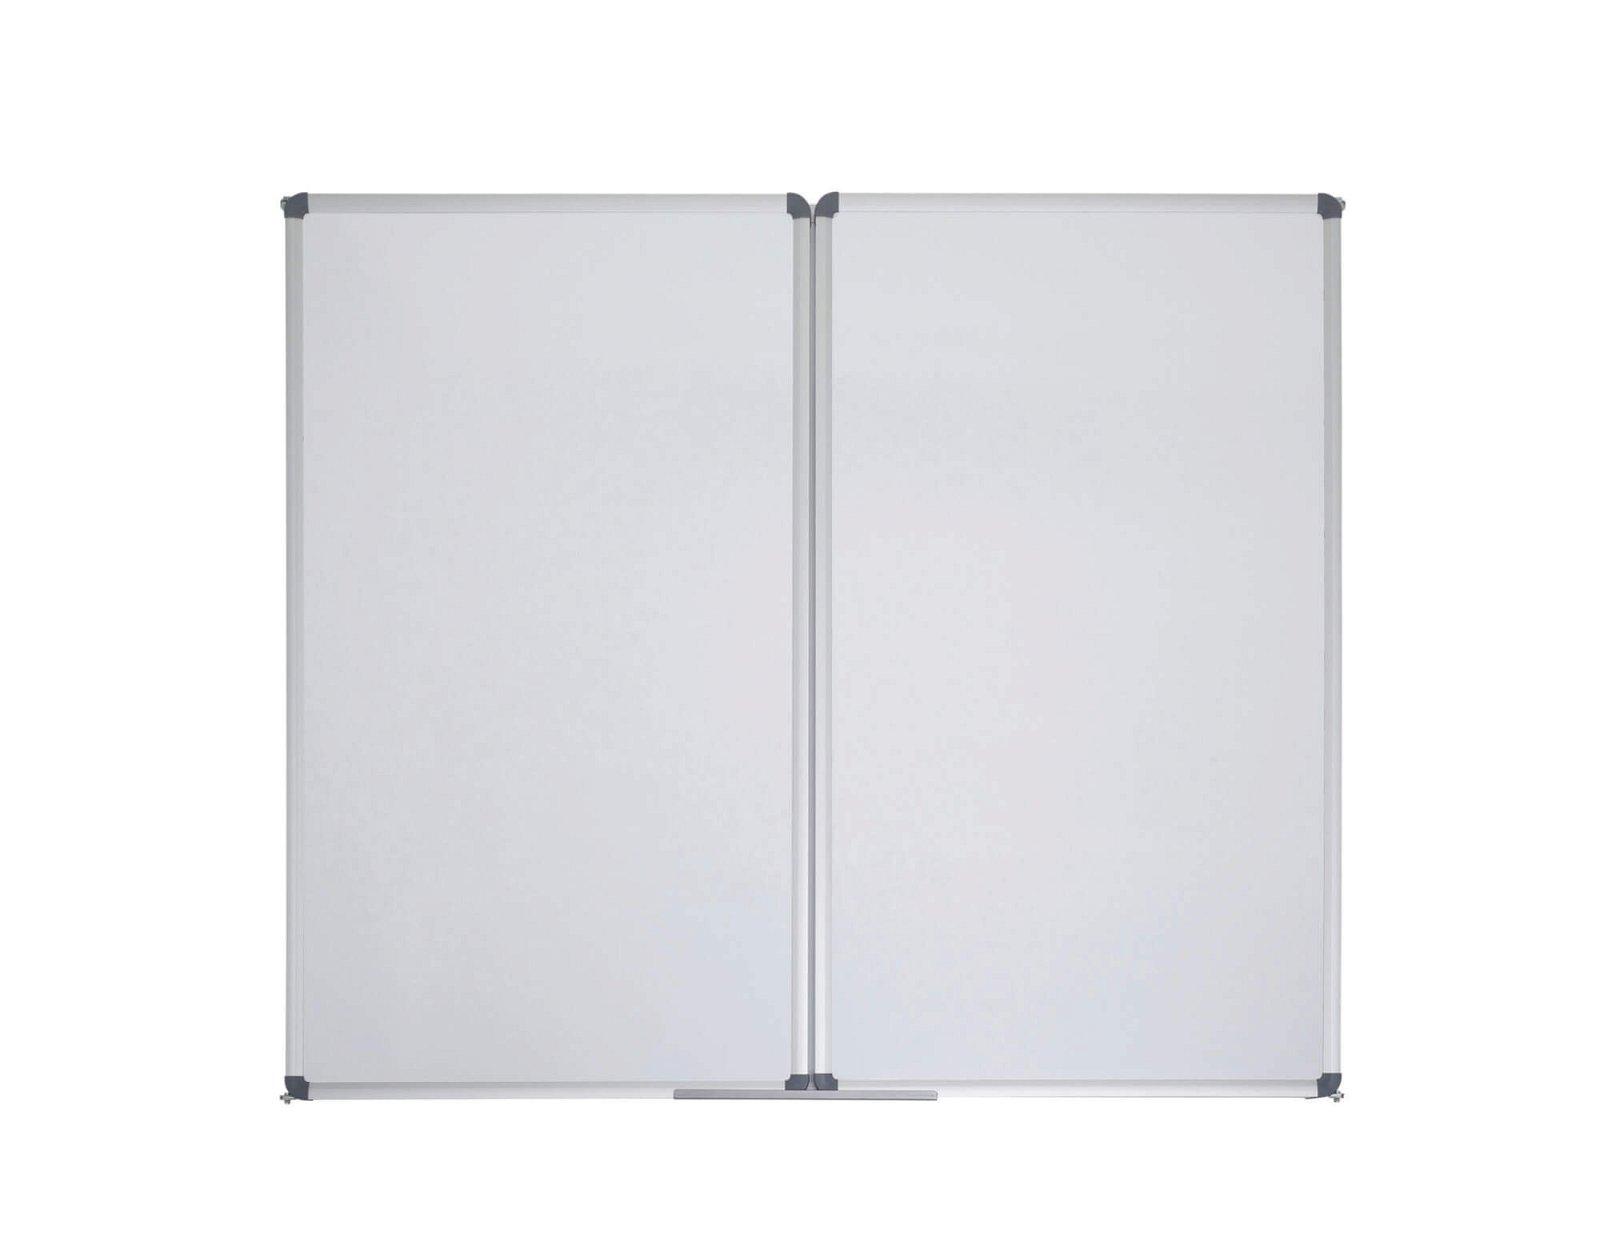 Whiteboard Klapptafel MAULstandard, 100x120 cm, grau